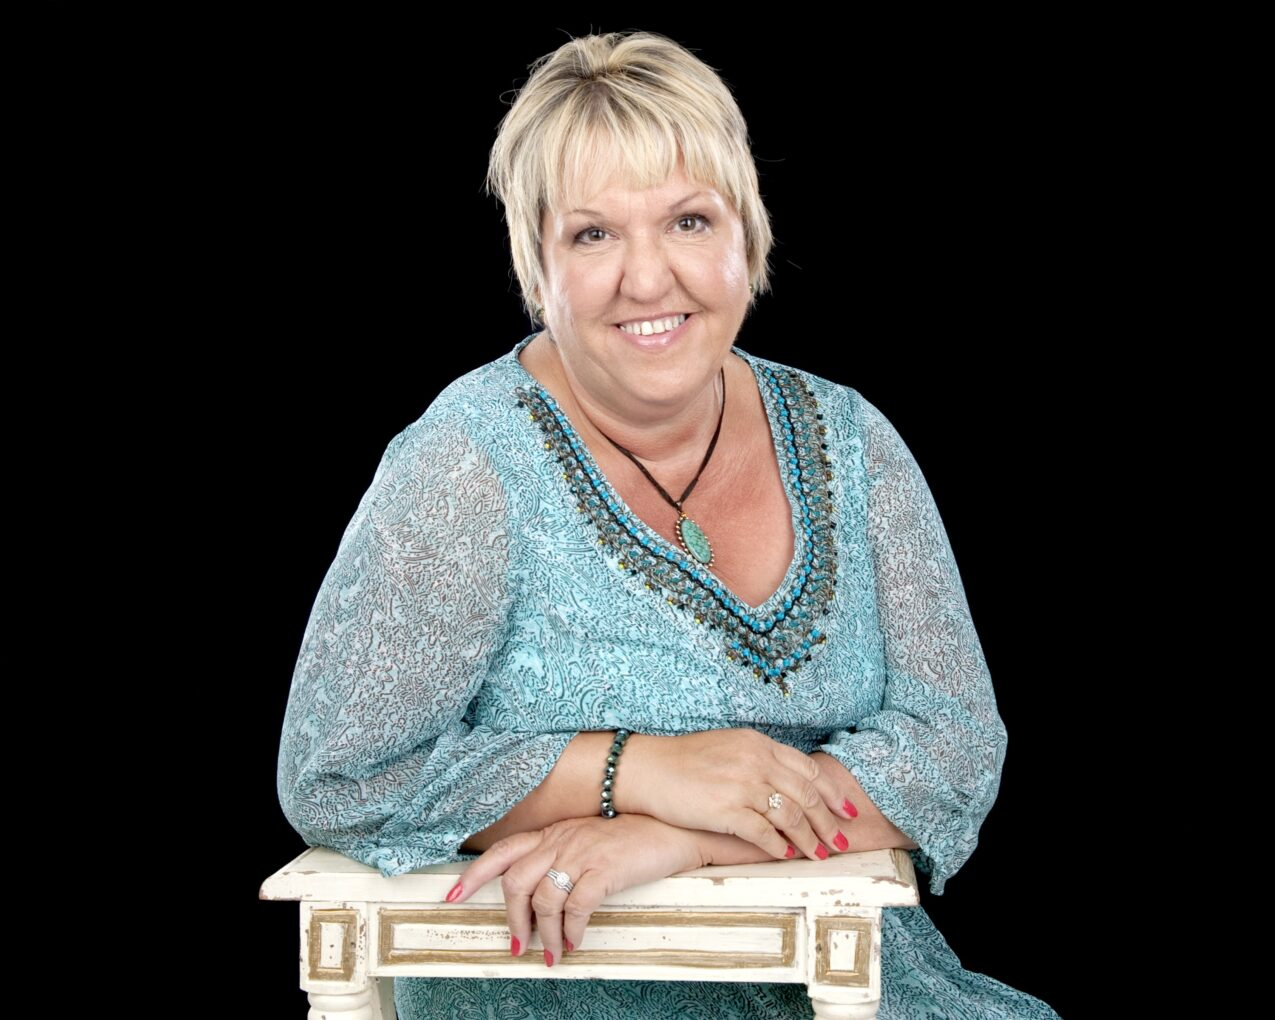 Deborah Baxter Hypnotherapist